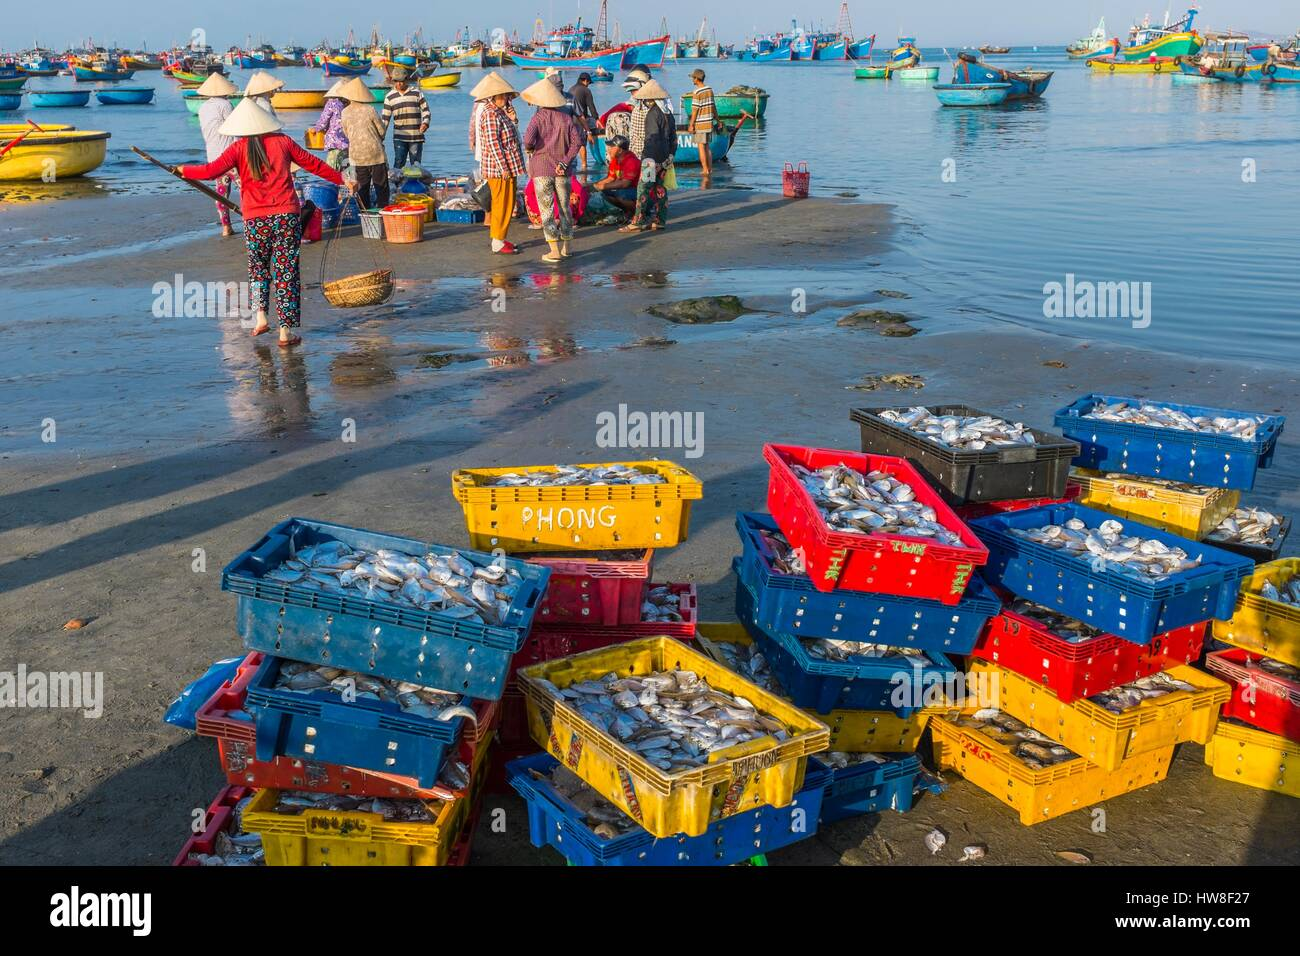 Vietnam, South Central Coast region, Mui Ne fishing village, return from fishing - Stock Image